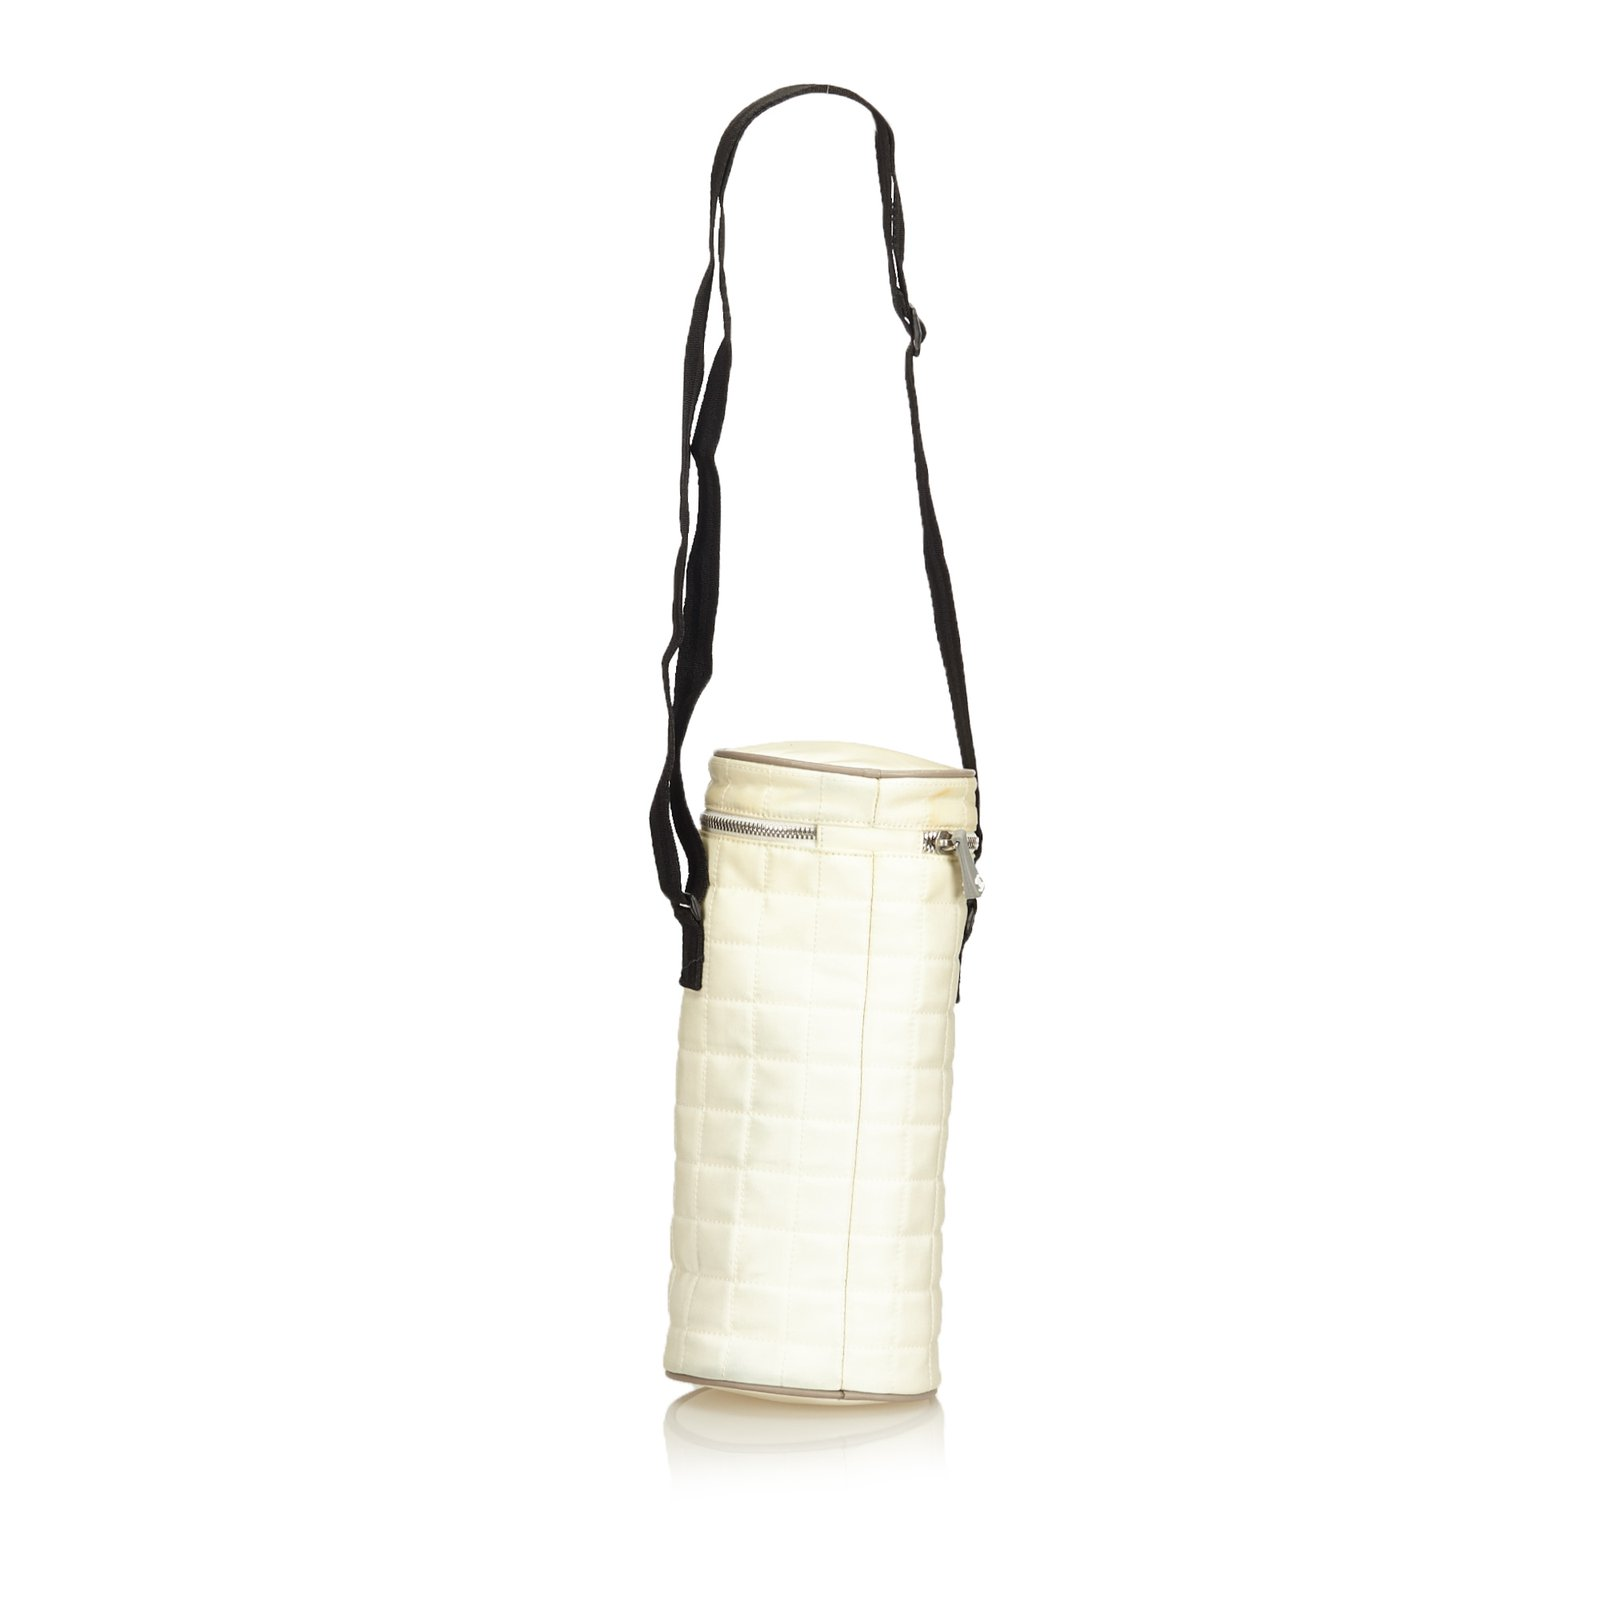 190b02c5122c Chanel Sport Line Quilted Nylon Shoulder Bag Handbags Nylon,Cloth Black, White,Cream ref.92950 - Joli Closet